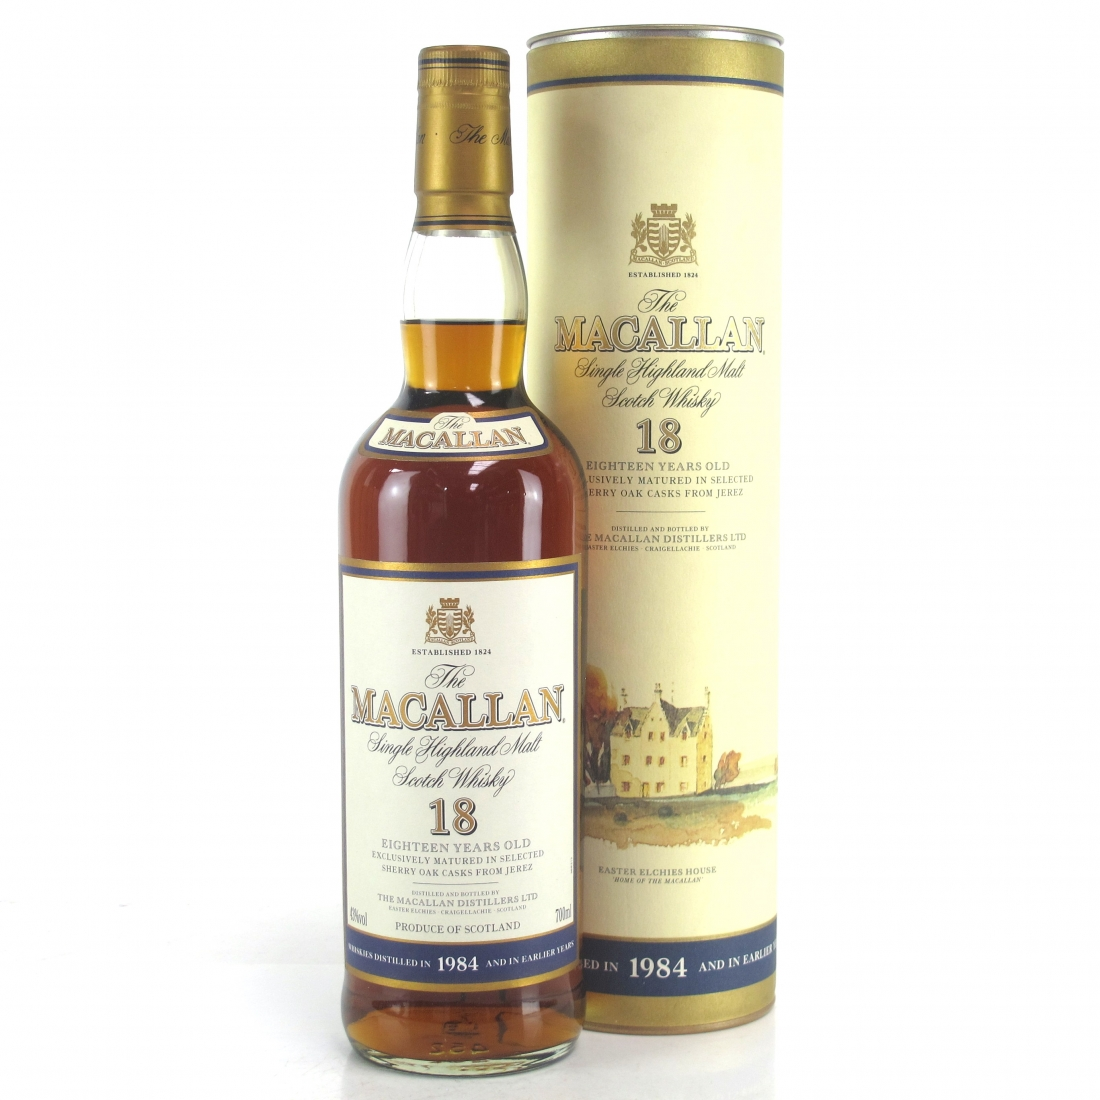 Macallan 18 Year Old 1984